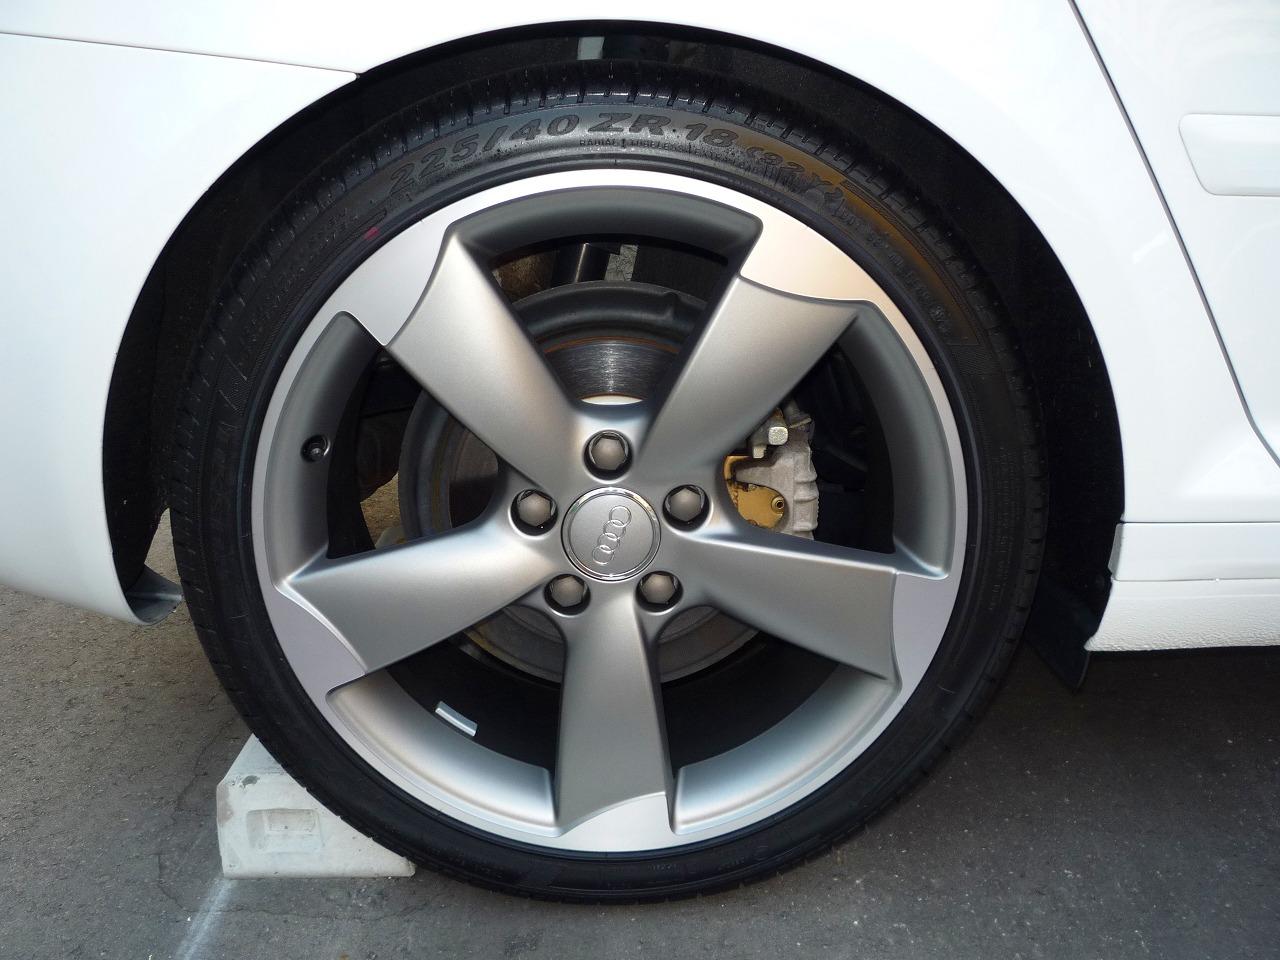 A3Audi純正(アウディ) 5 Arm Rotor Wheelの単体画像